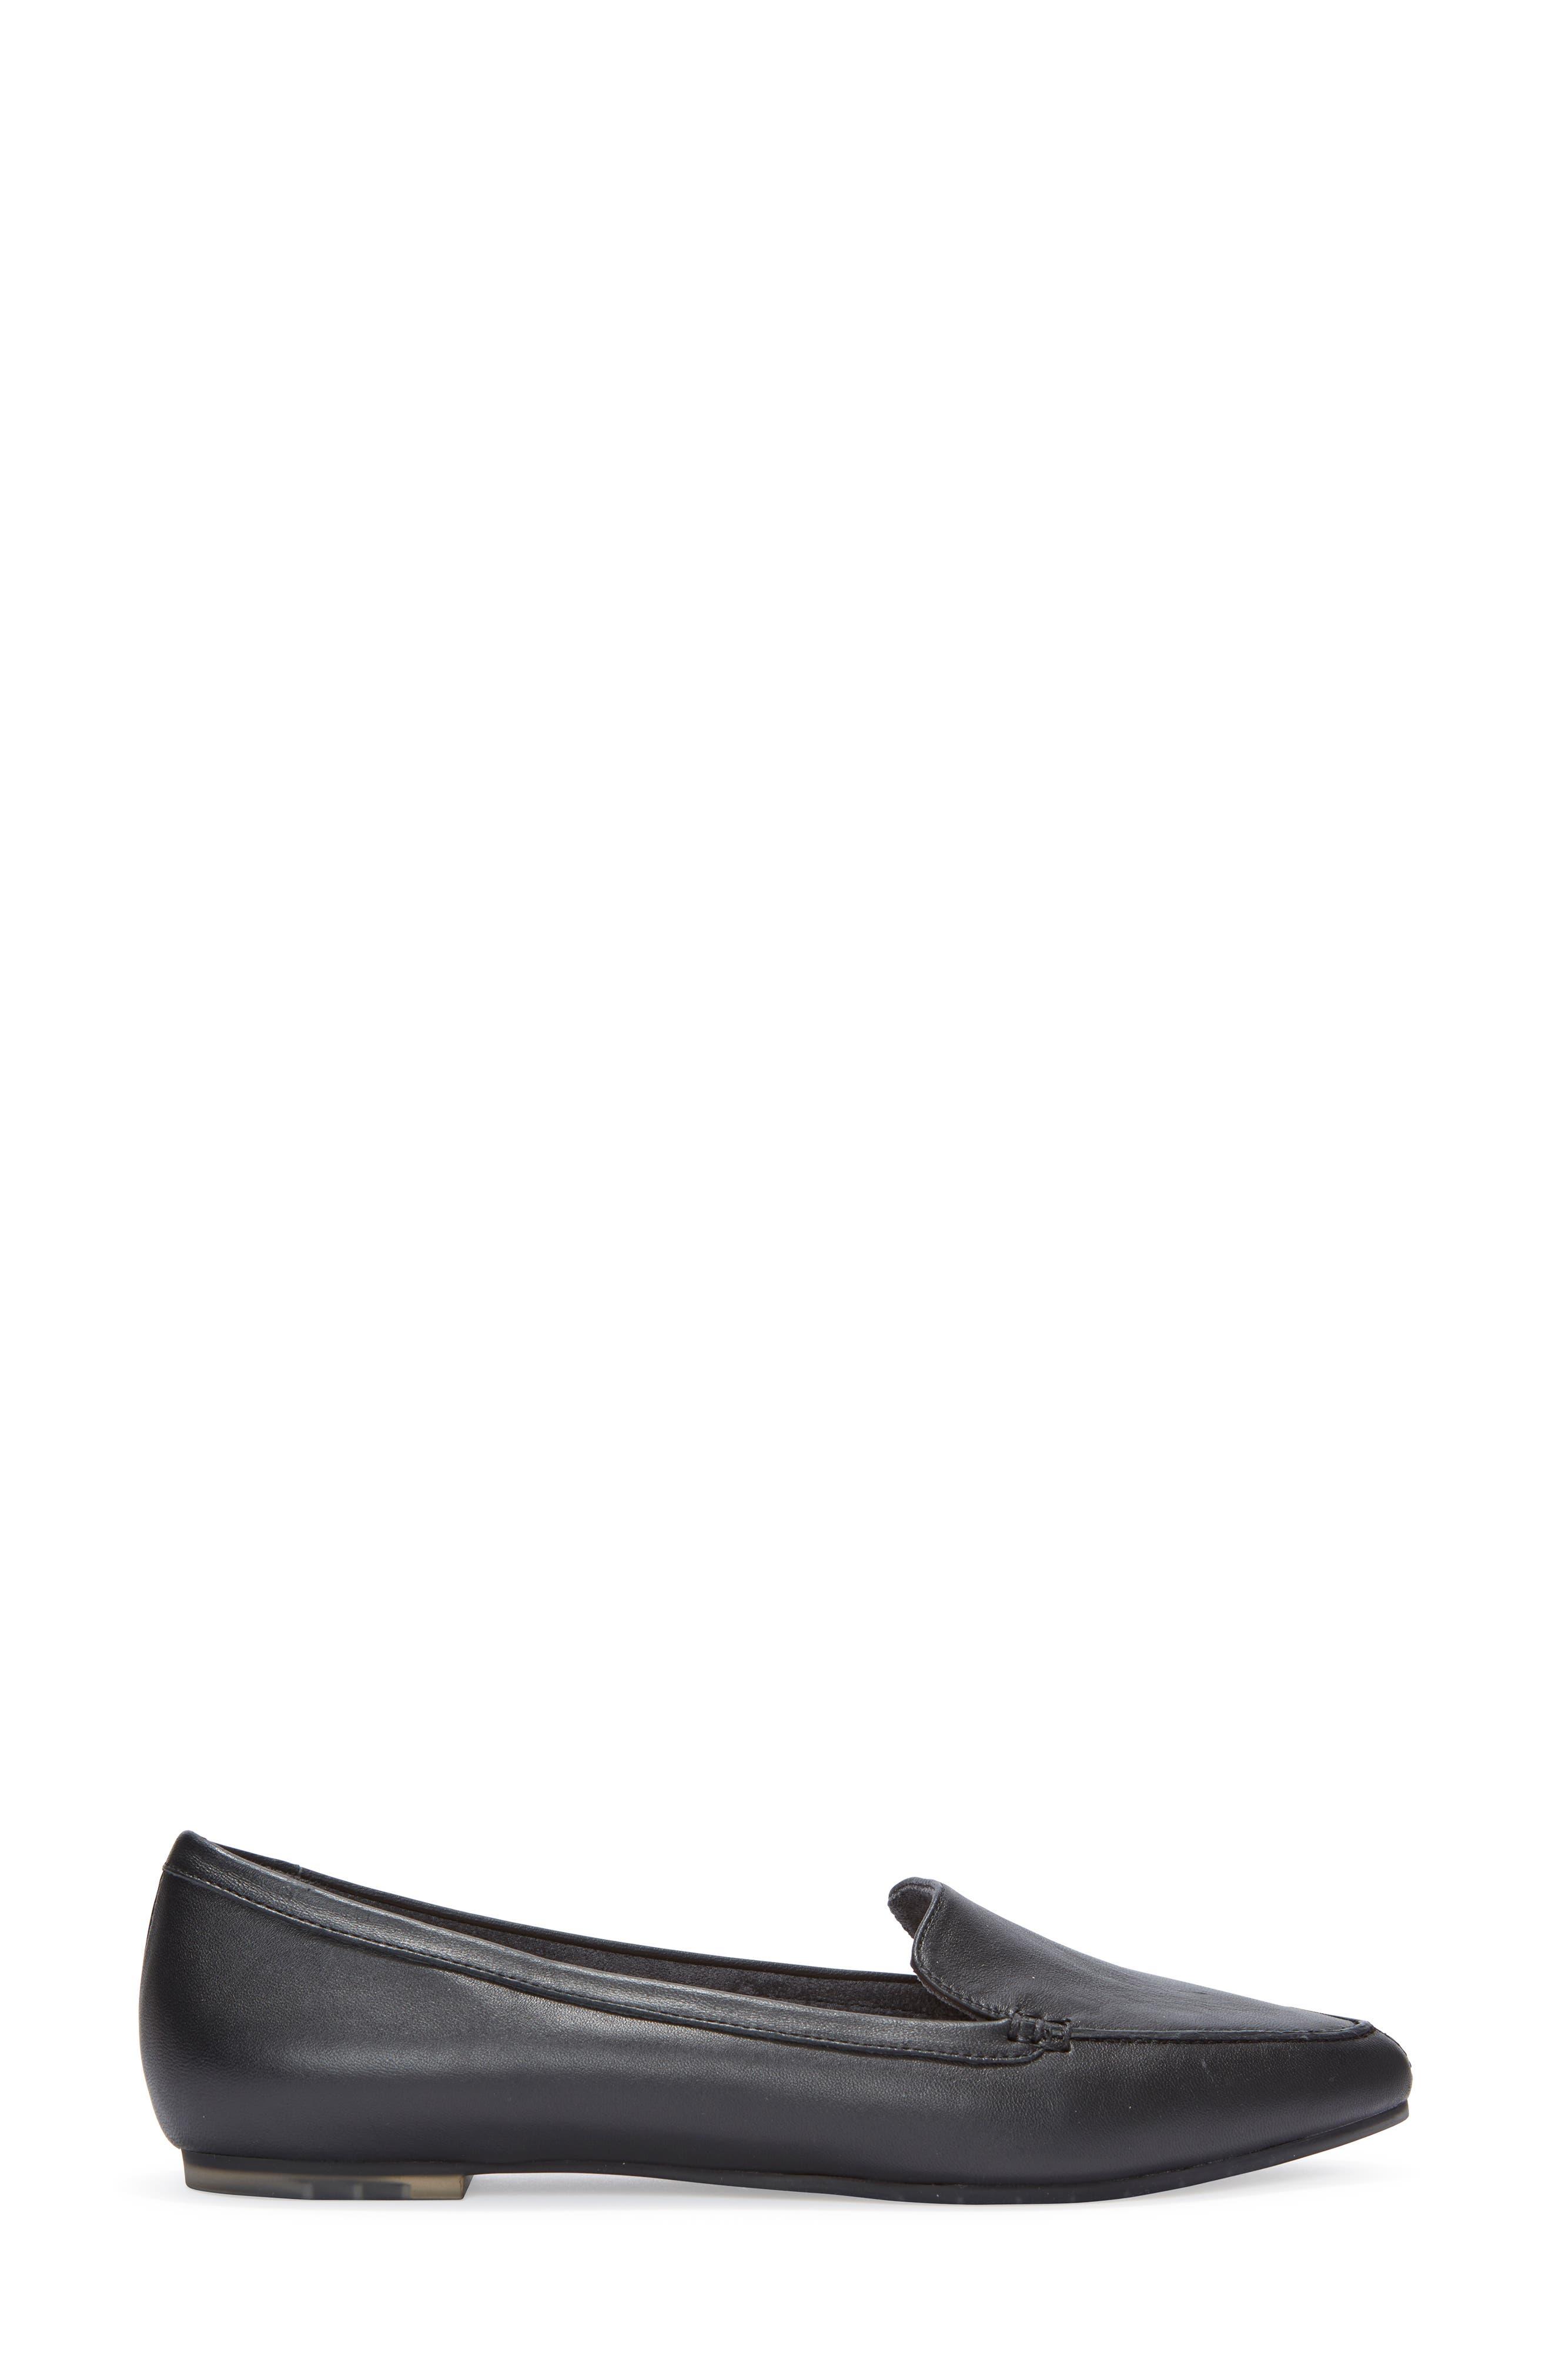 Audra Loafer Flat,                             Alternate thumbnail 3, color,                             BLACK/ BLACK LEATHER